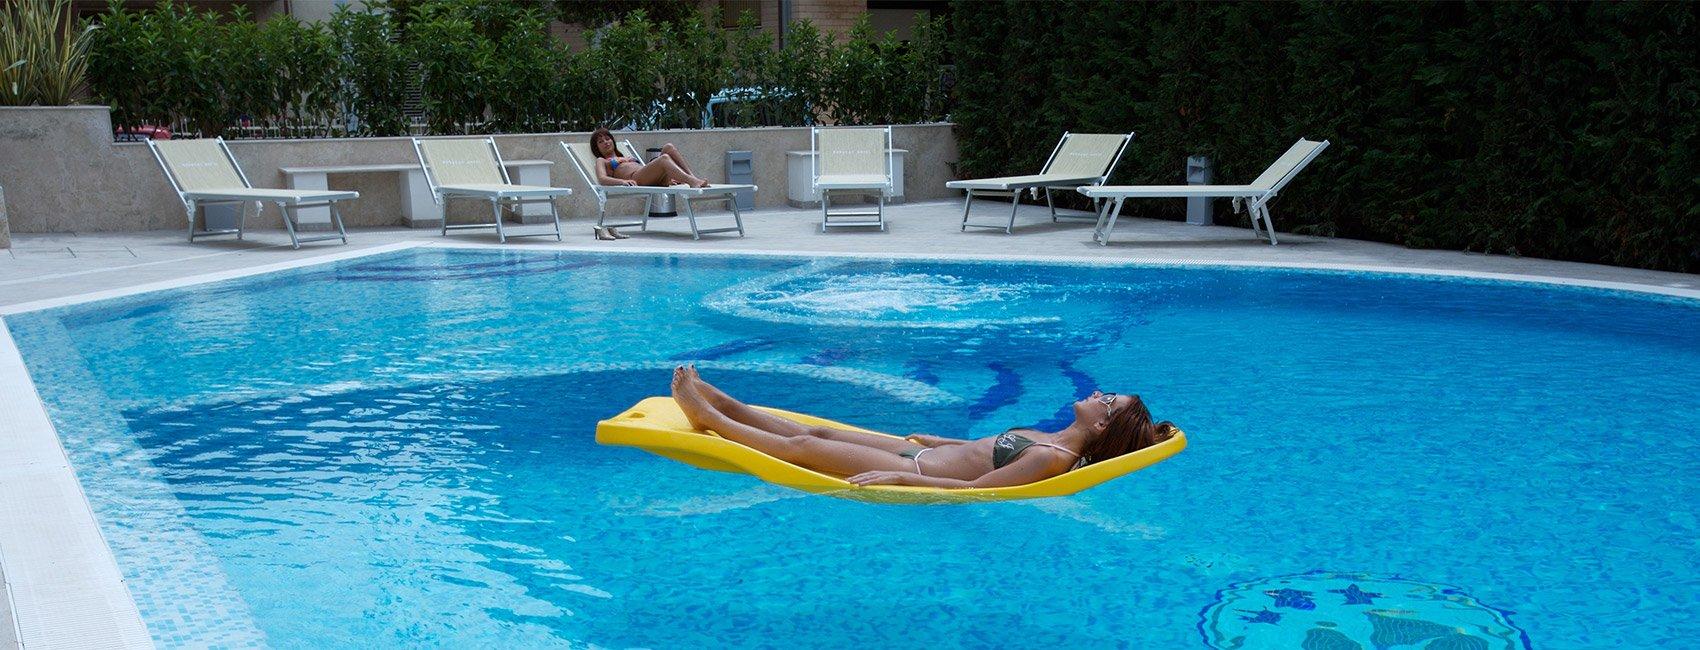 piscina hotel borcay alba adriatica